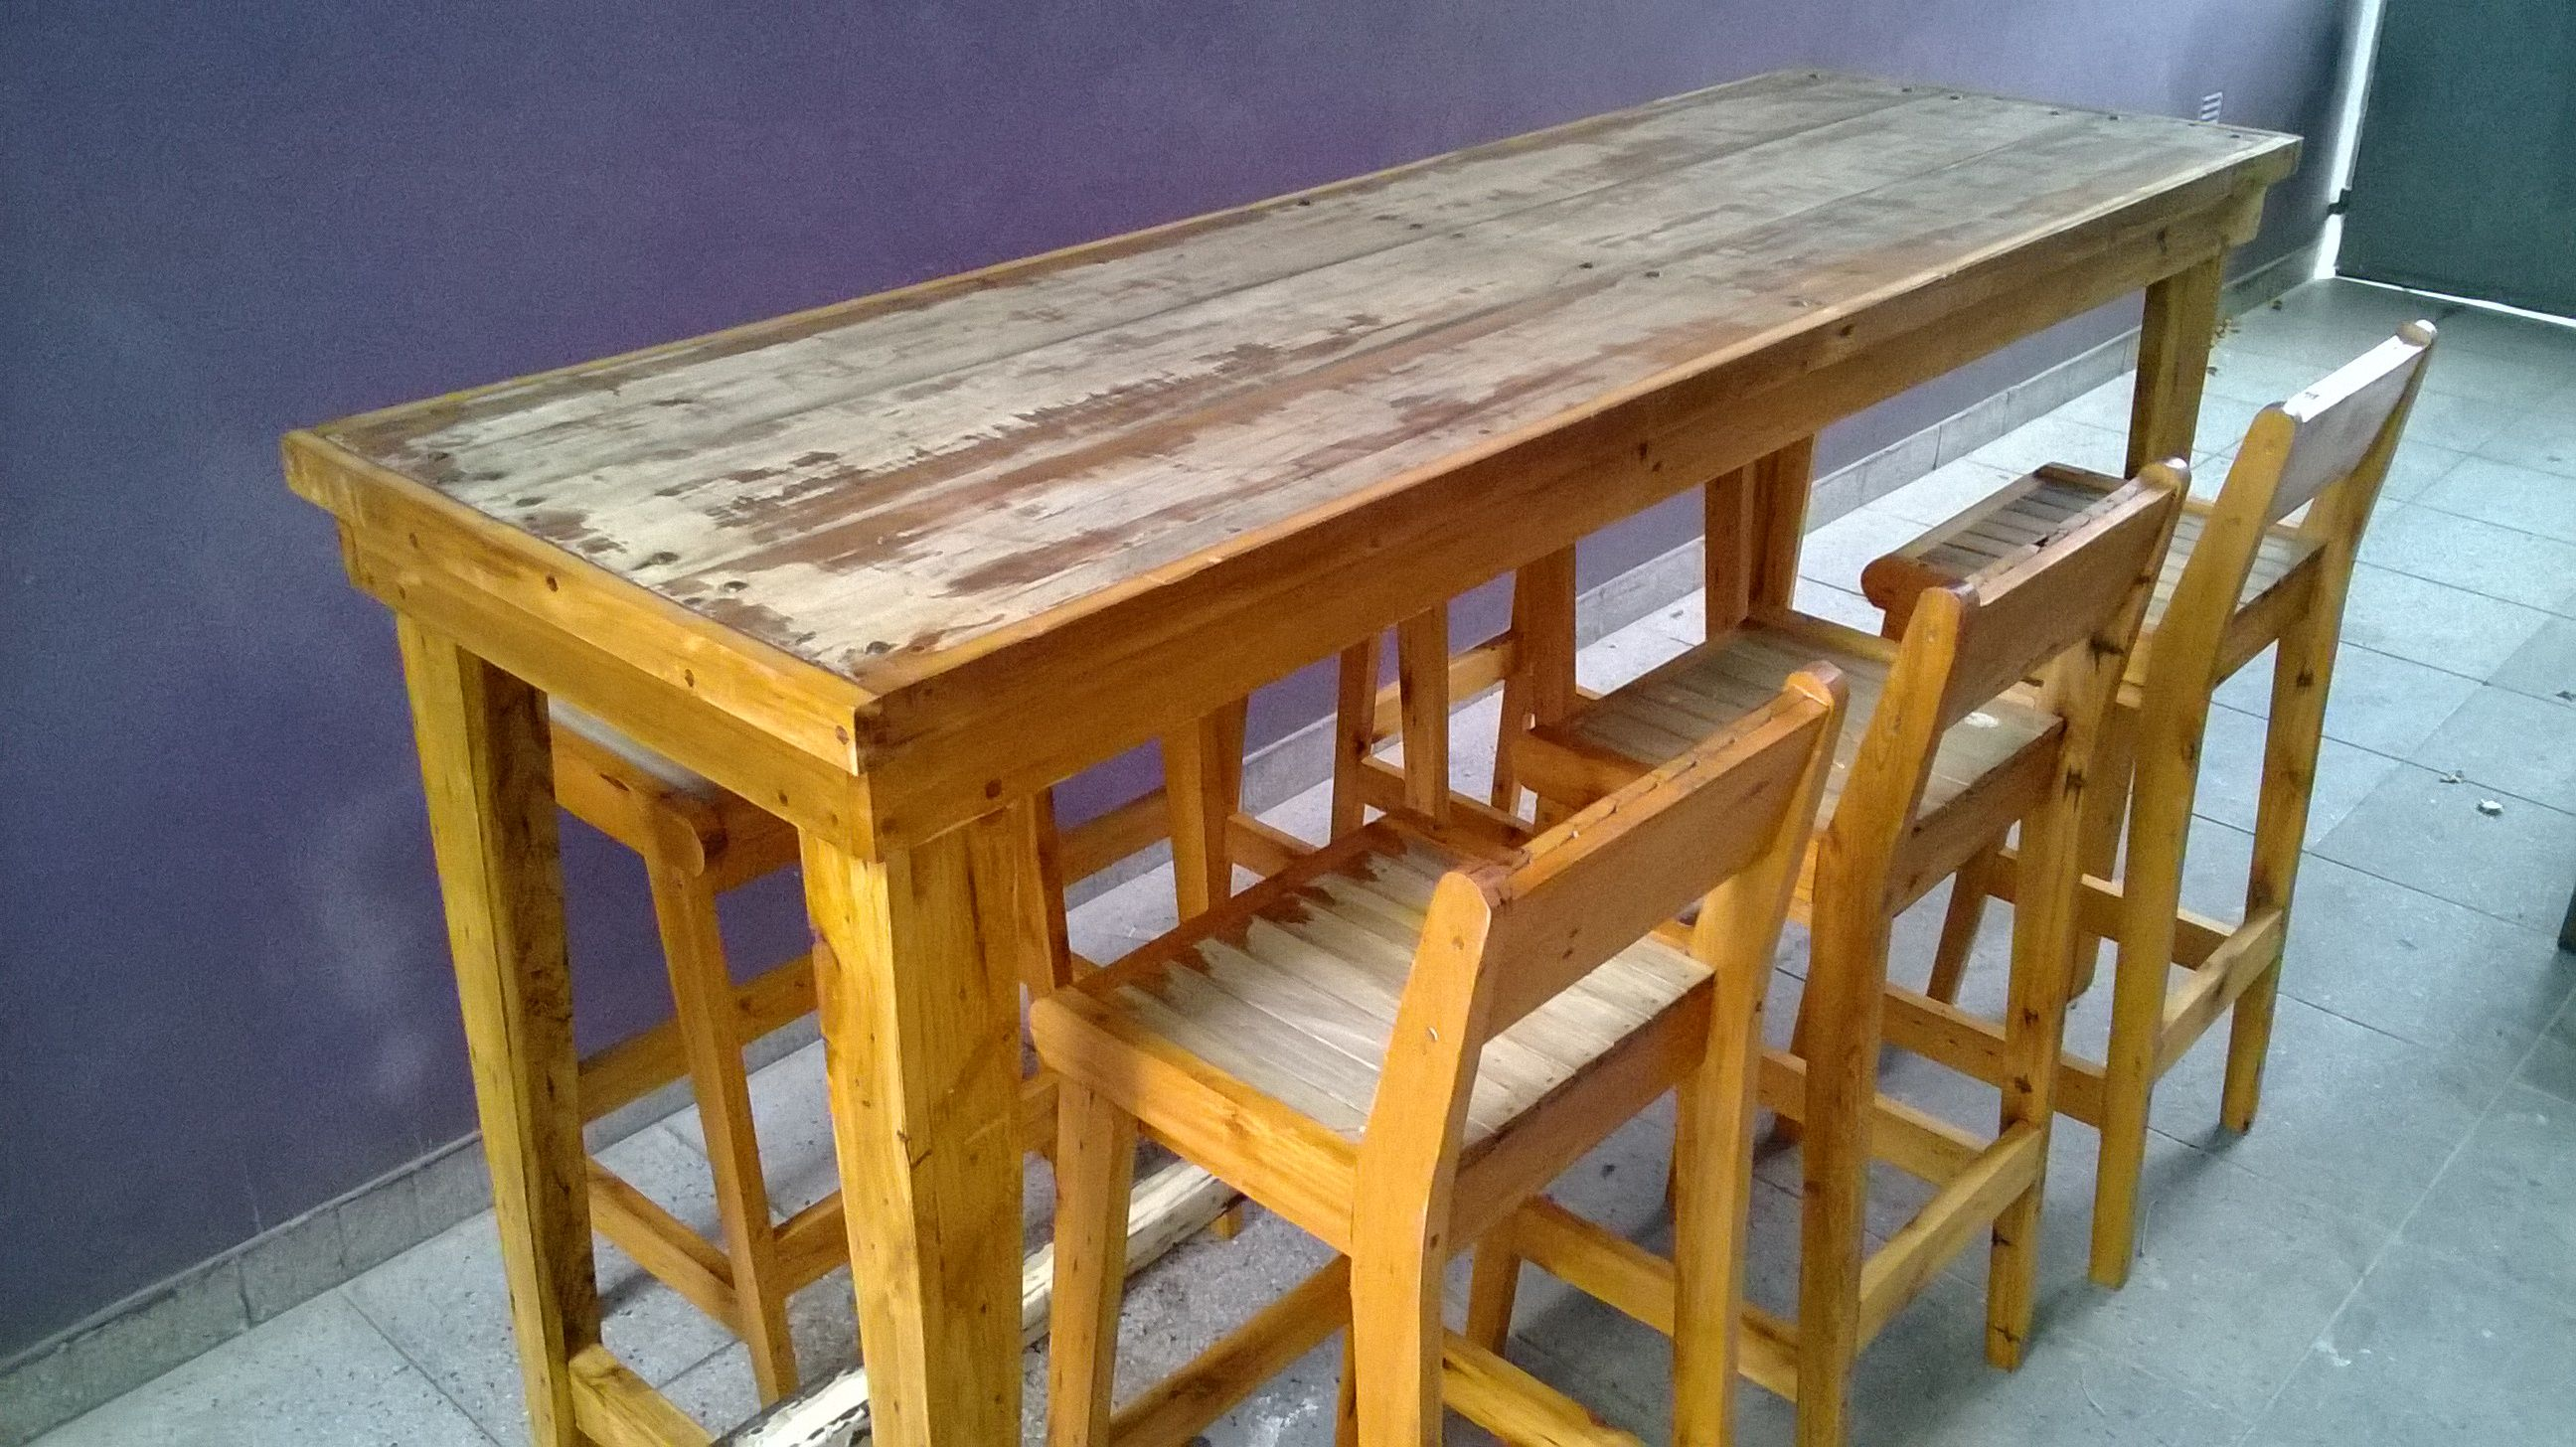 Barra desayunadora madera maciza pinterest barra for Maderas para barras desayunadoras